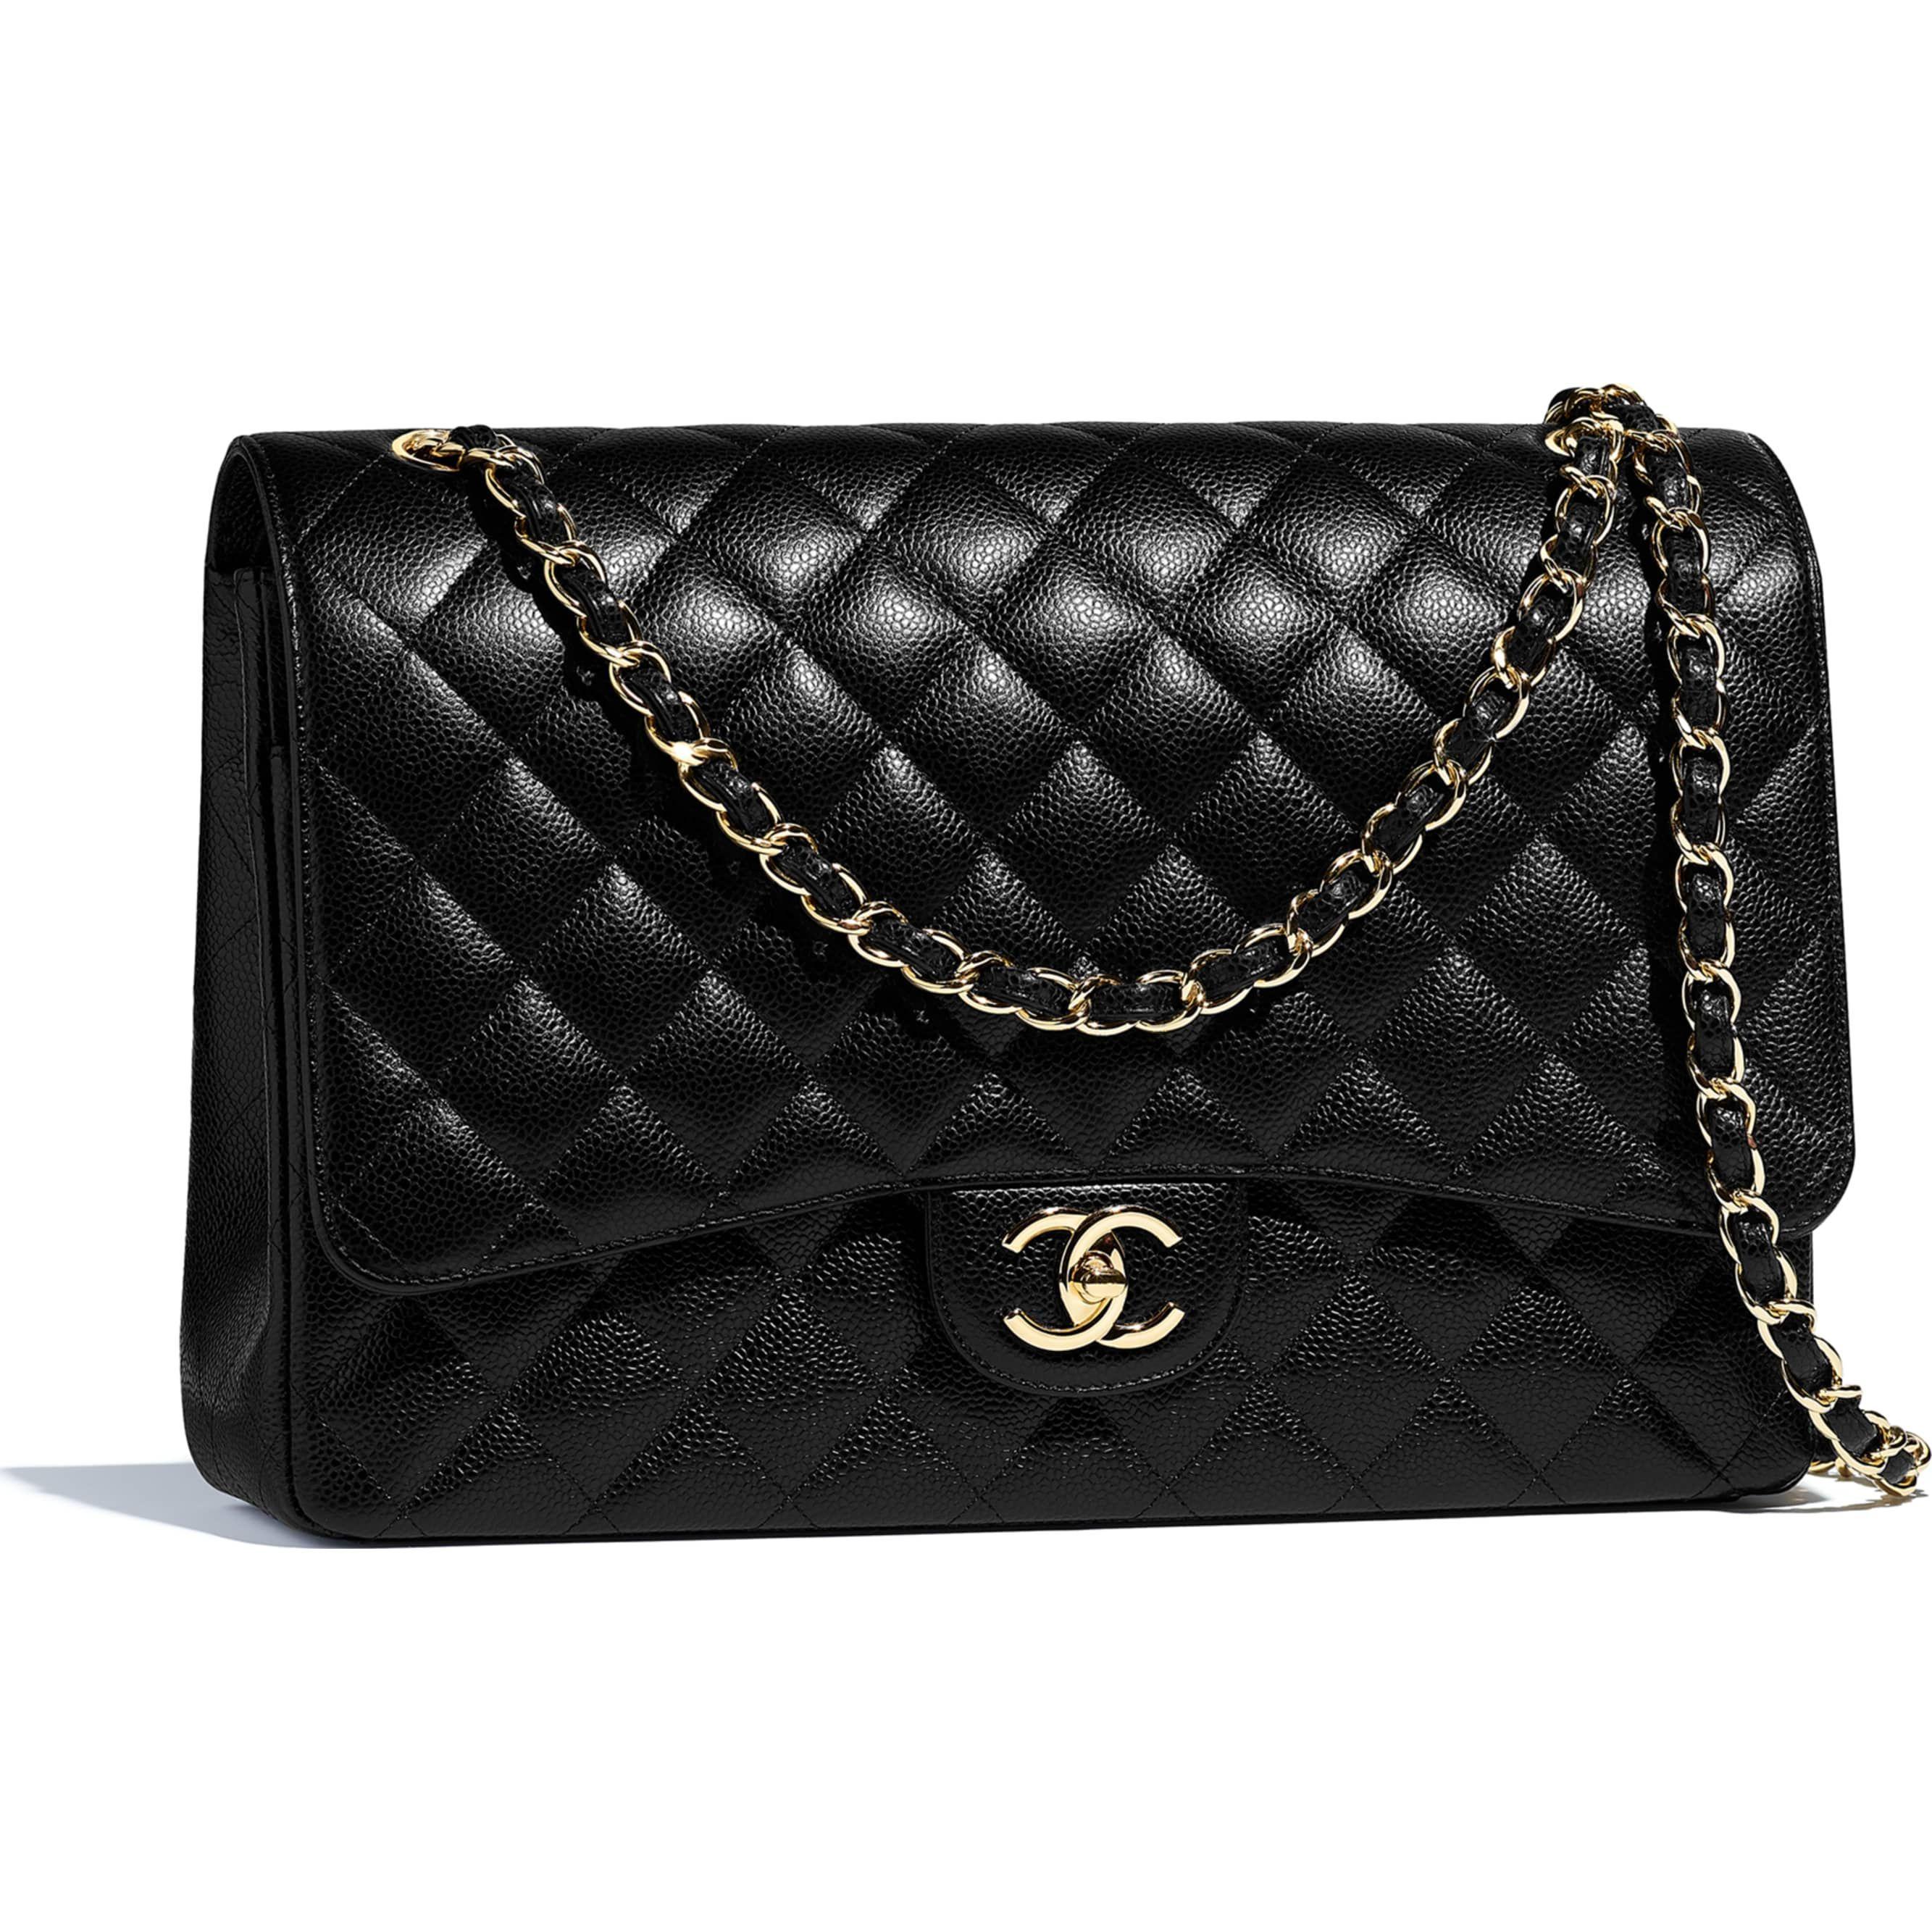 c7927acb4412 CHANEL Maxi Classic Handbag Grained Calfskin   Gold-Tone Metal Ref. A58601  Y01864 C3906